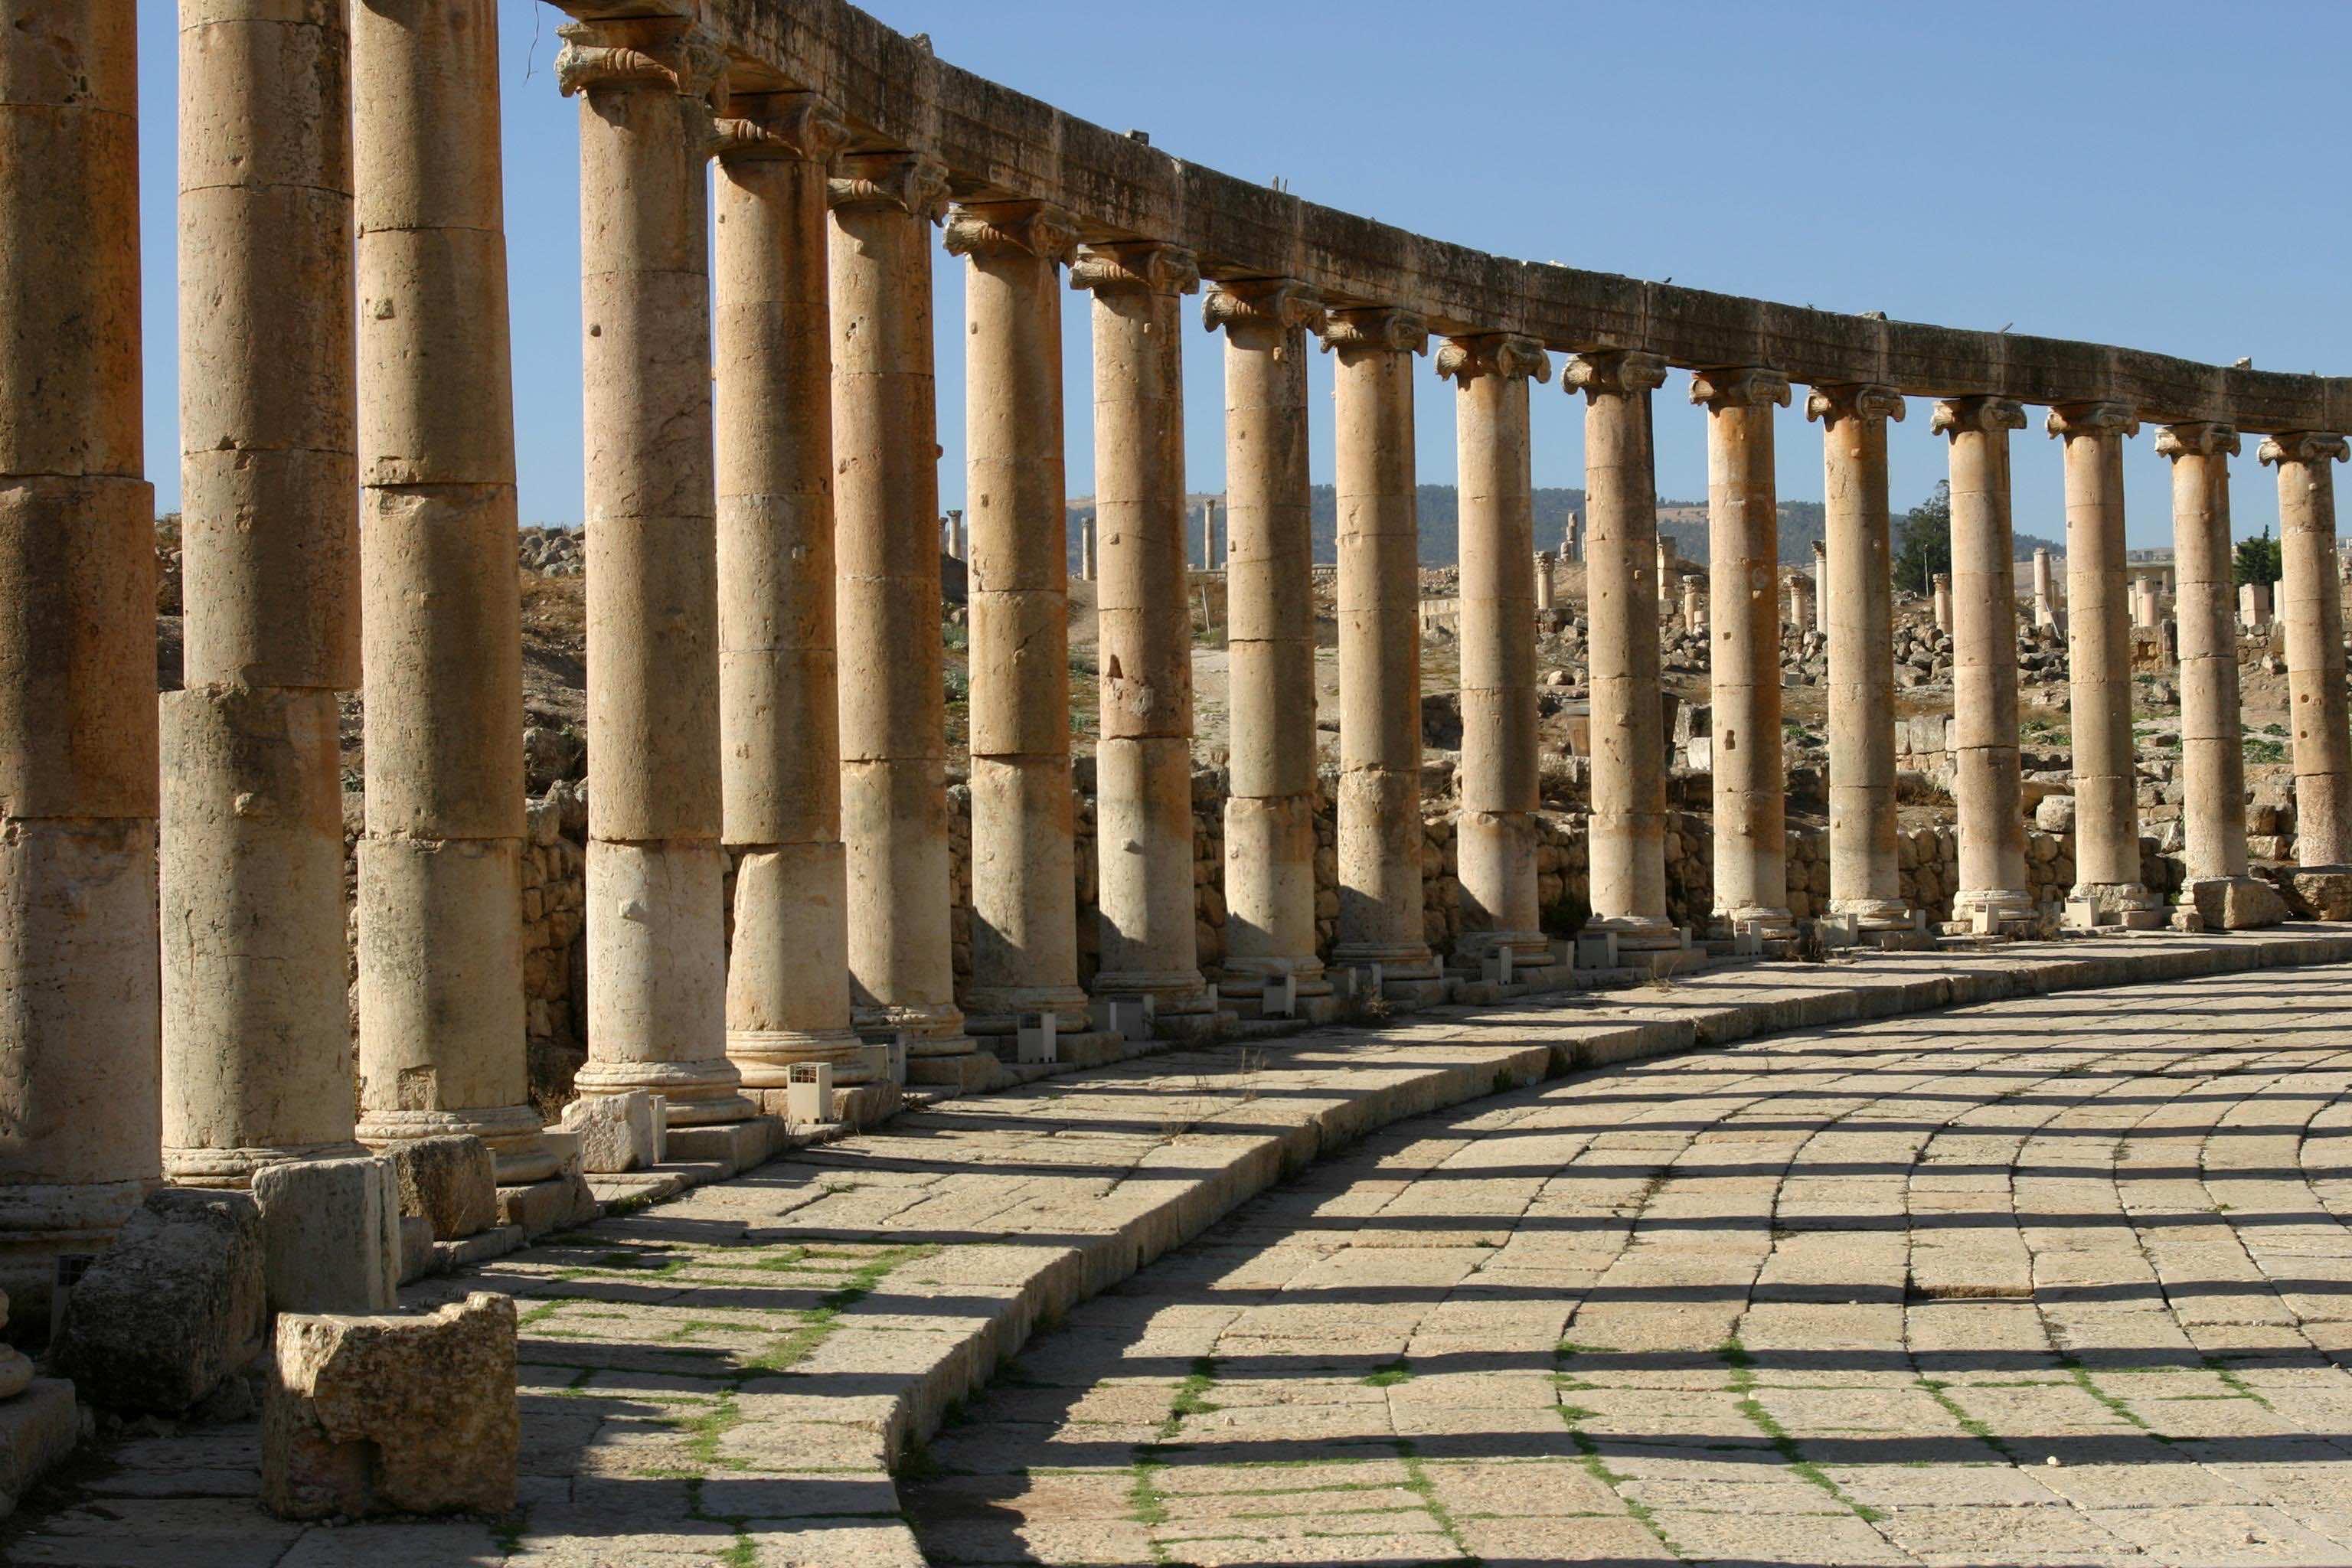 Pillars And Columns : What is a column